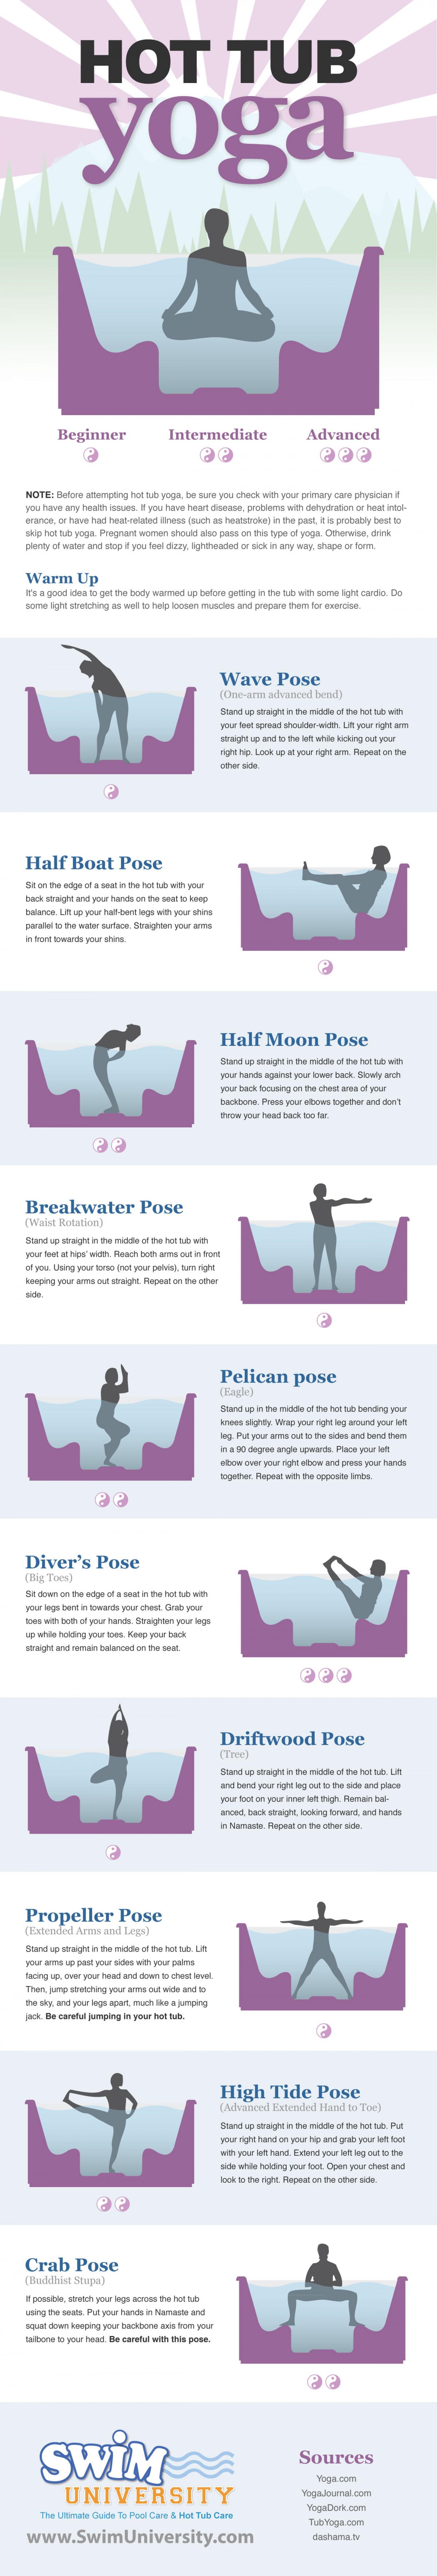 5 Yoga-infographic